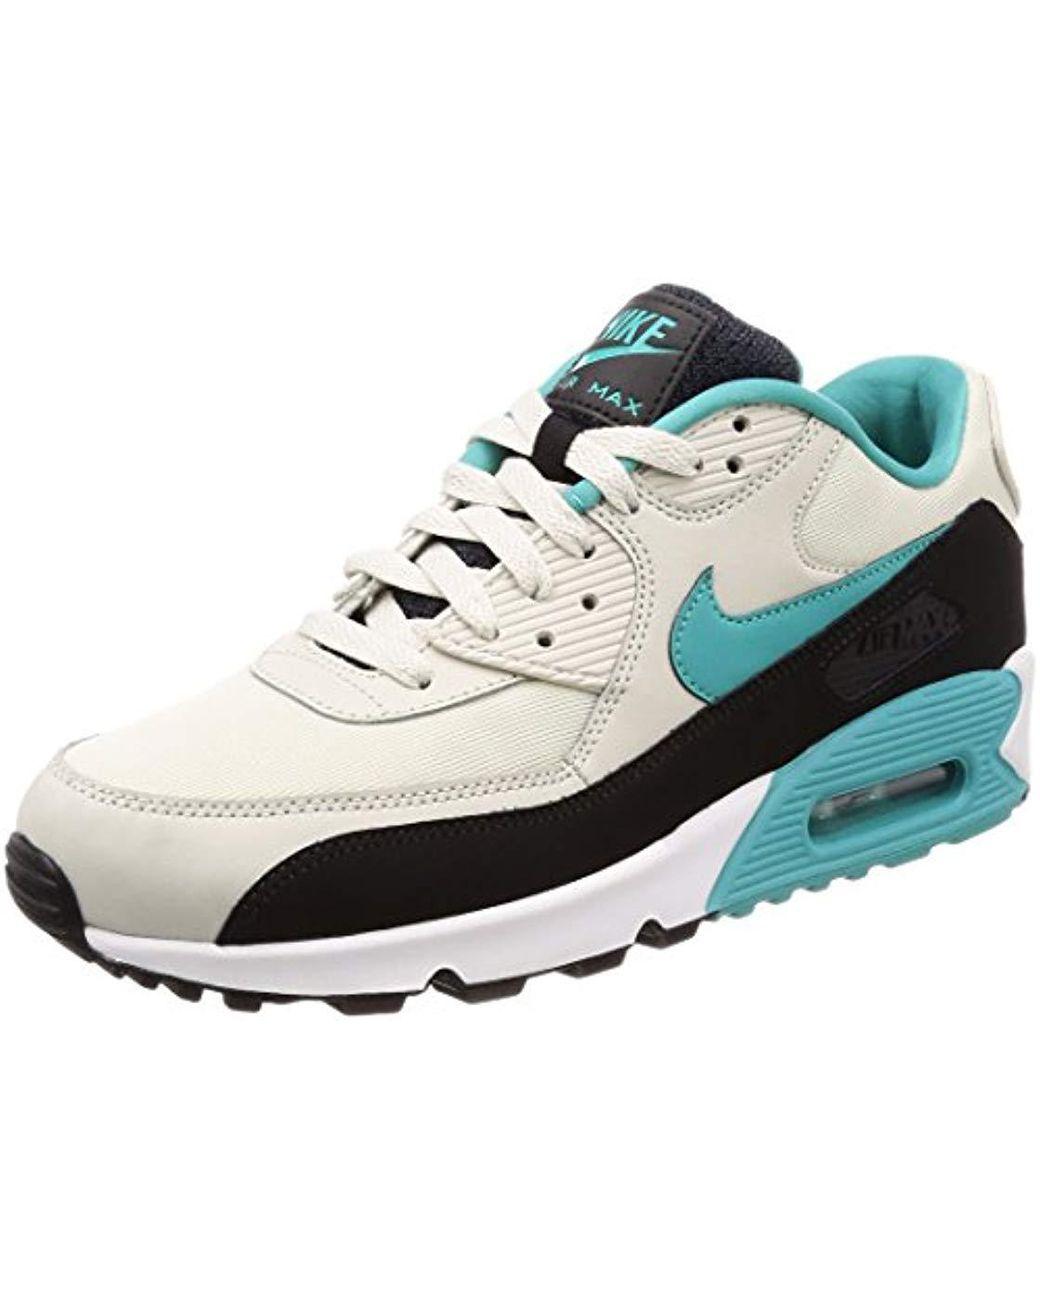 best service 162bf 3b179 Nike. Men s Air Max 90 Essential Gymnastics Shoes Black